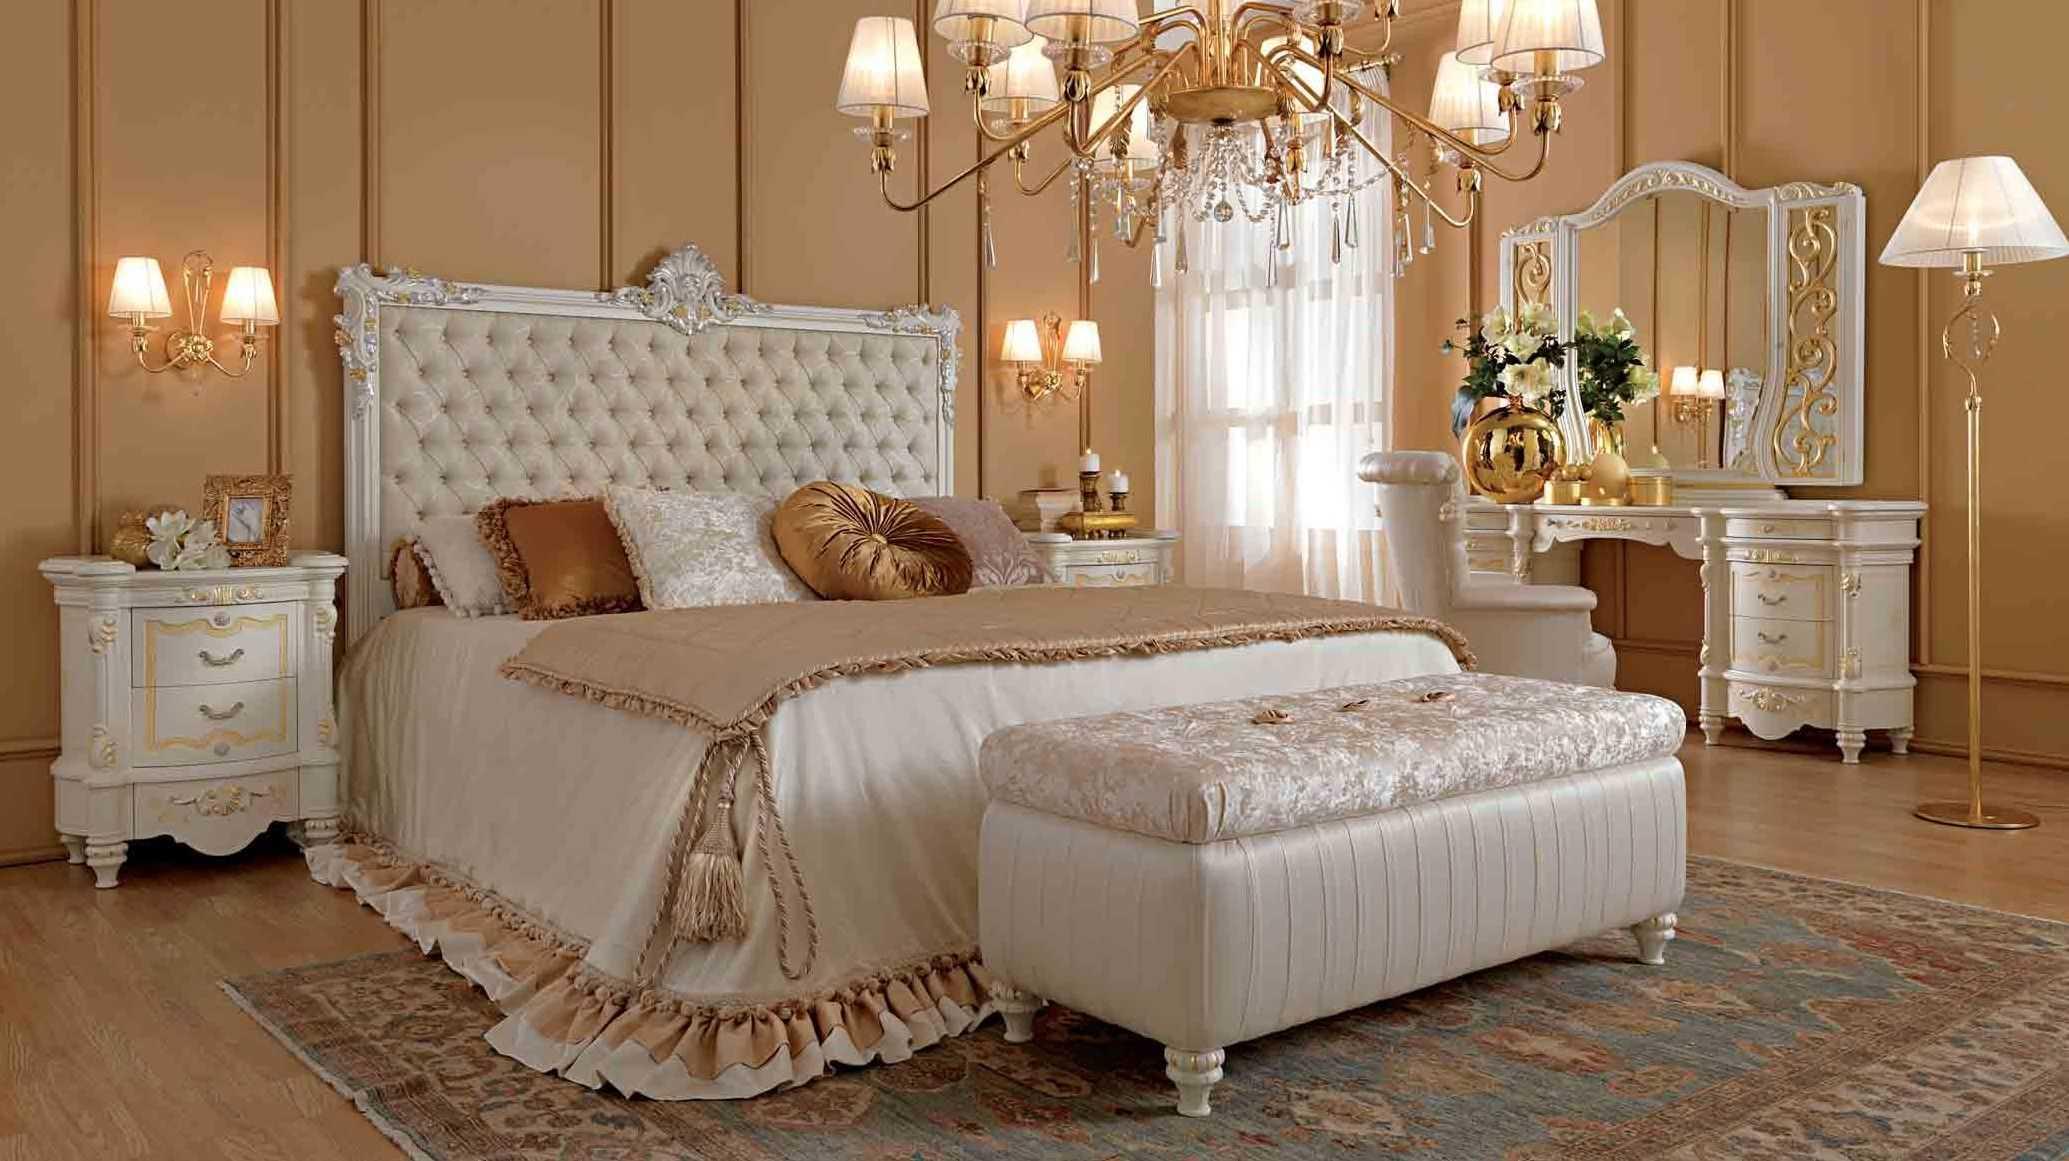 Мебель у кровати